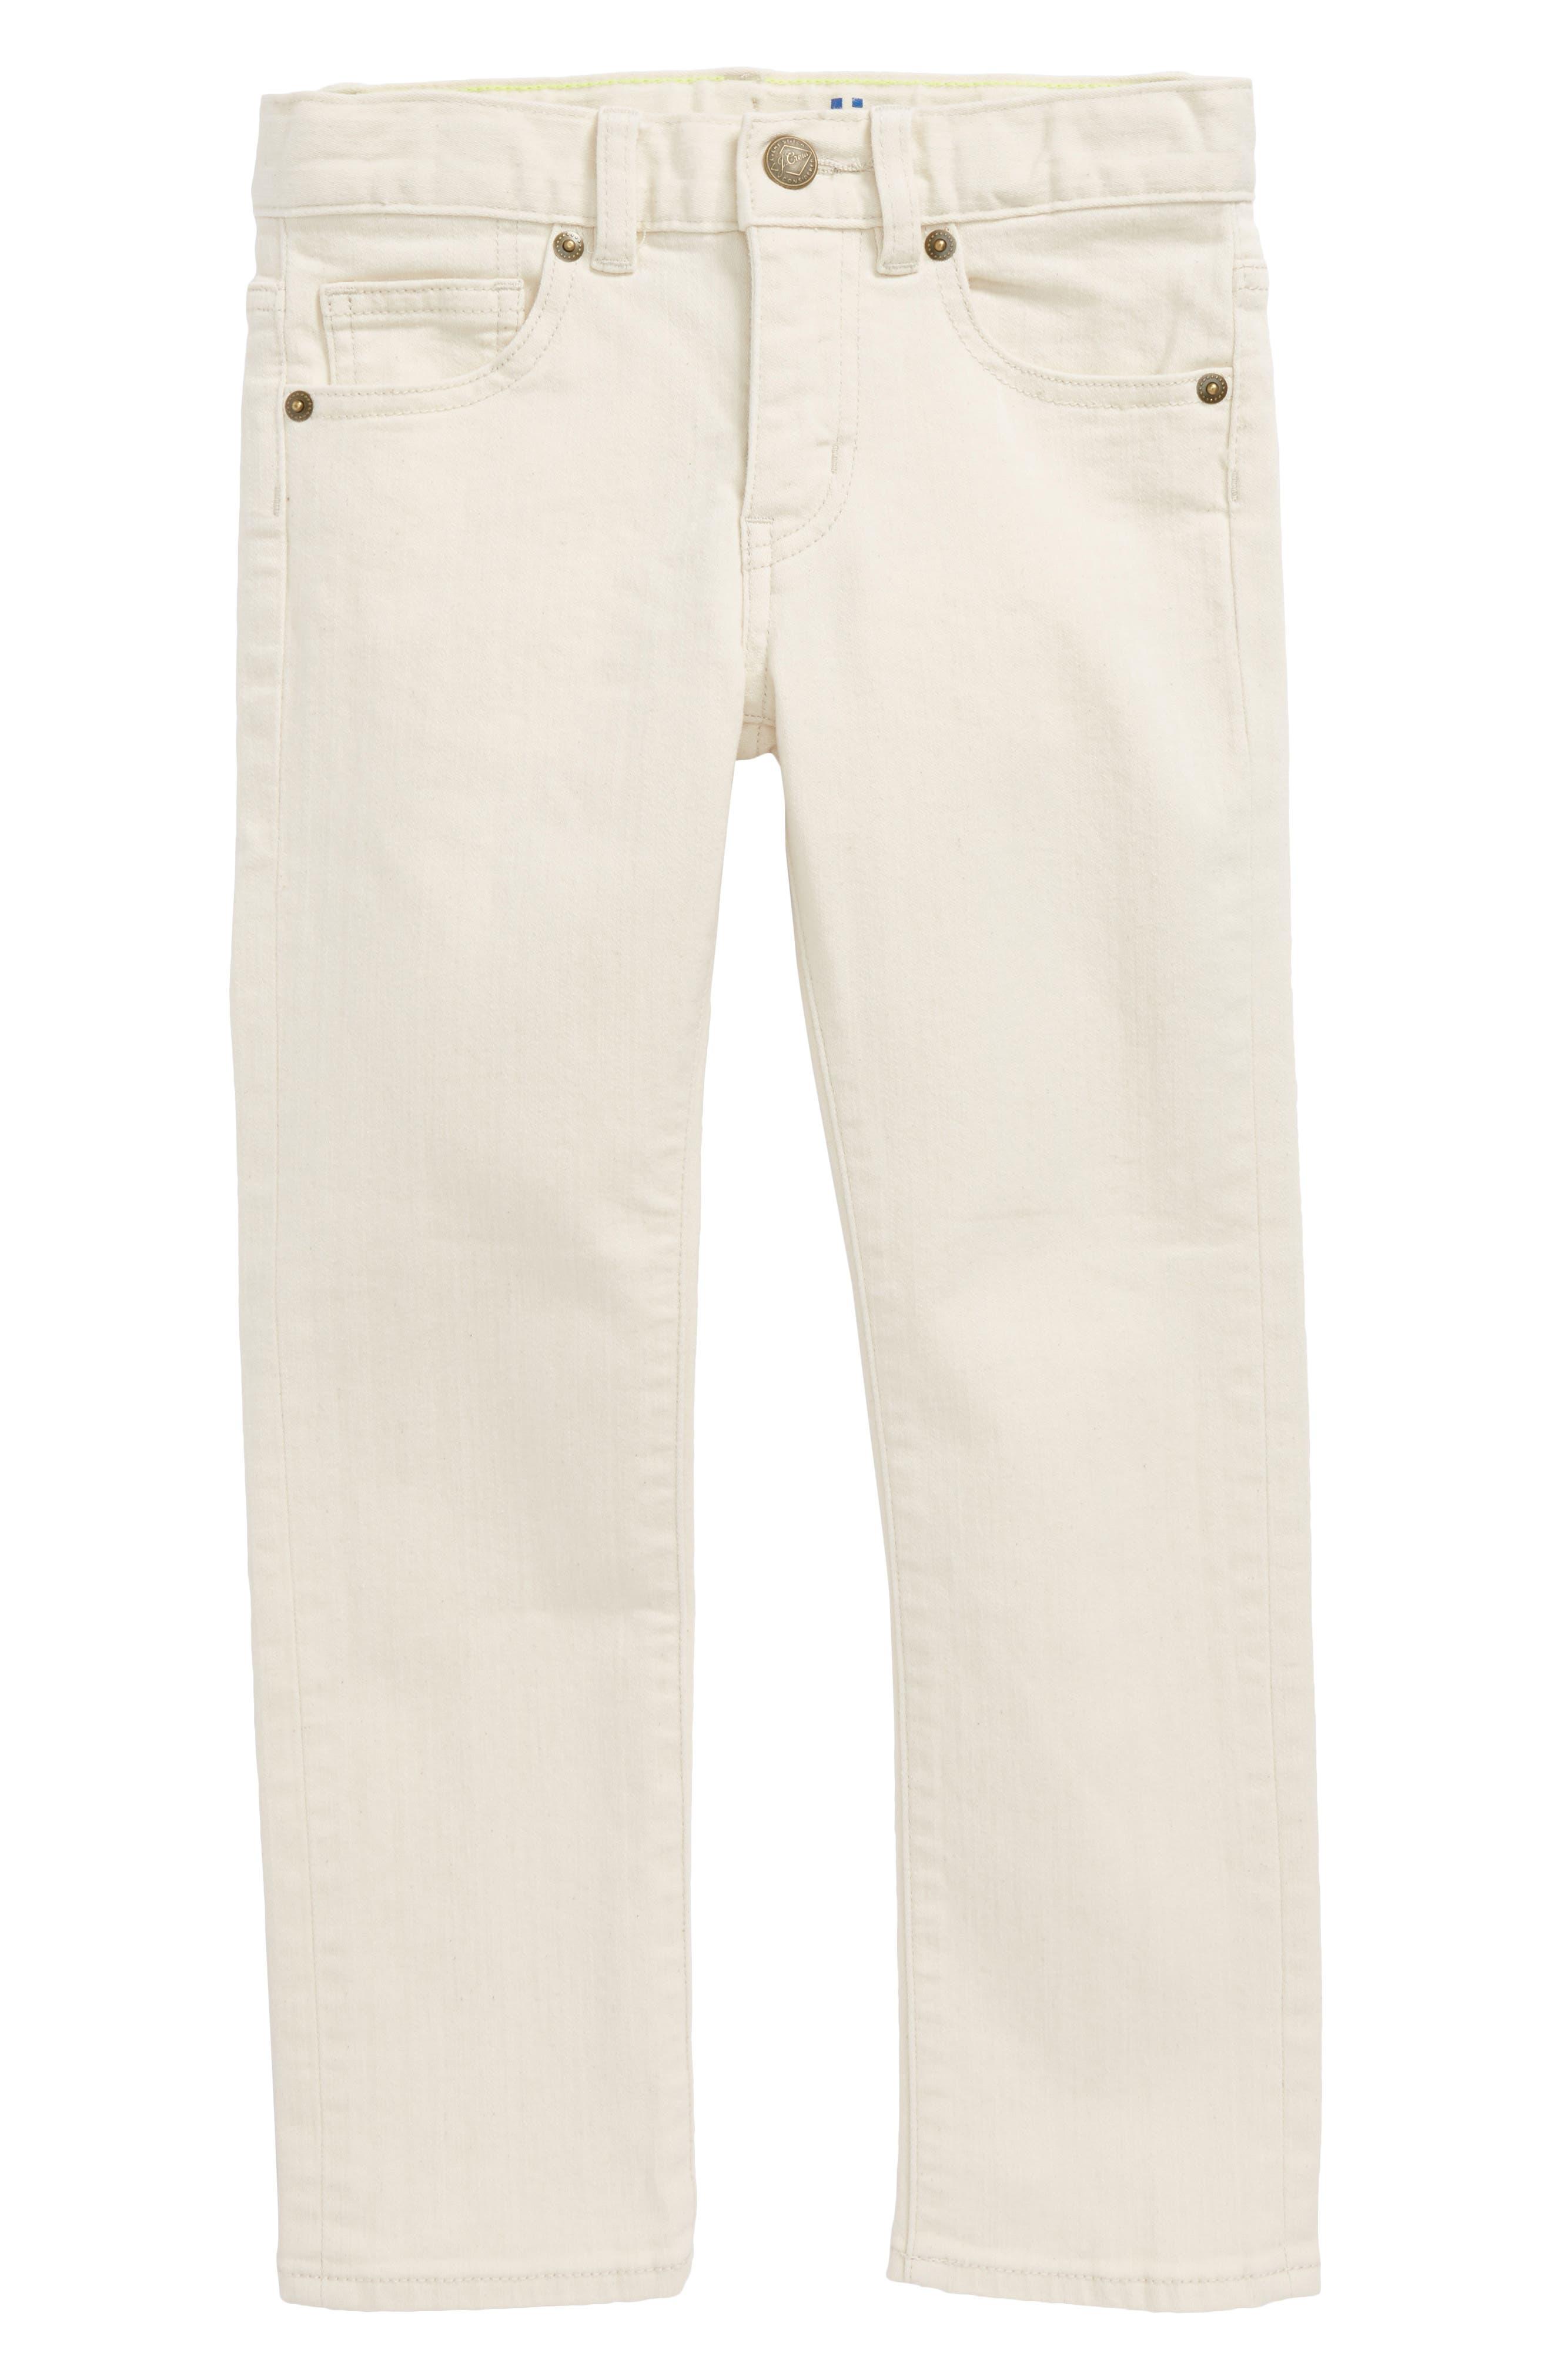 Ecru Slim Fit Pants,                         Main,                         color, 900